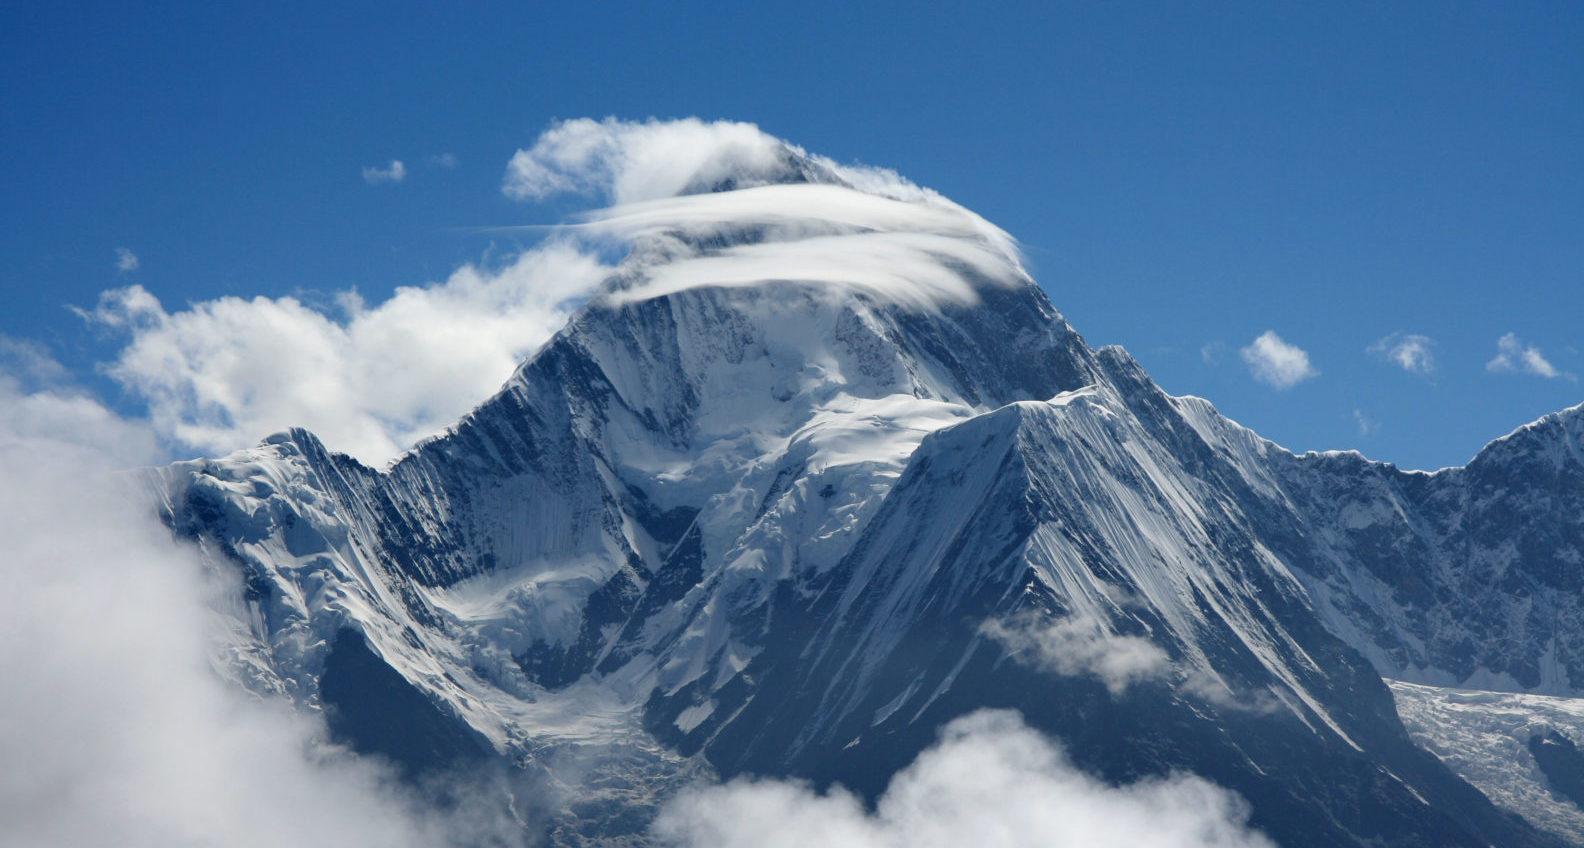 Mt. Gongga, 贡嘎山 (7,566m)